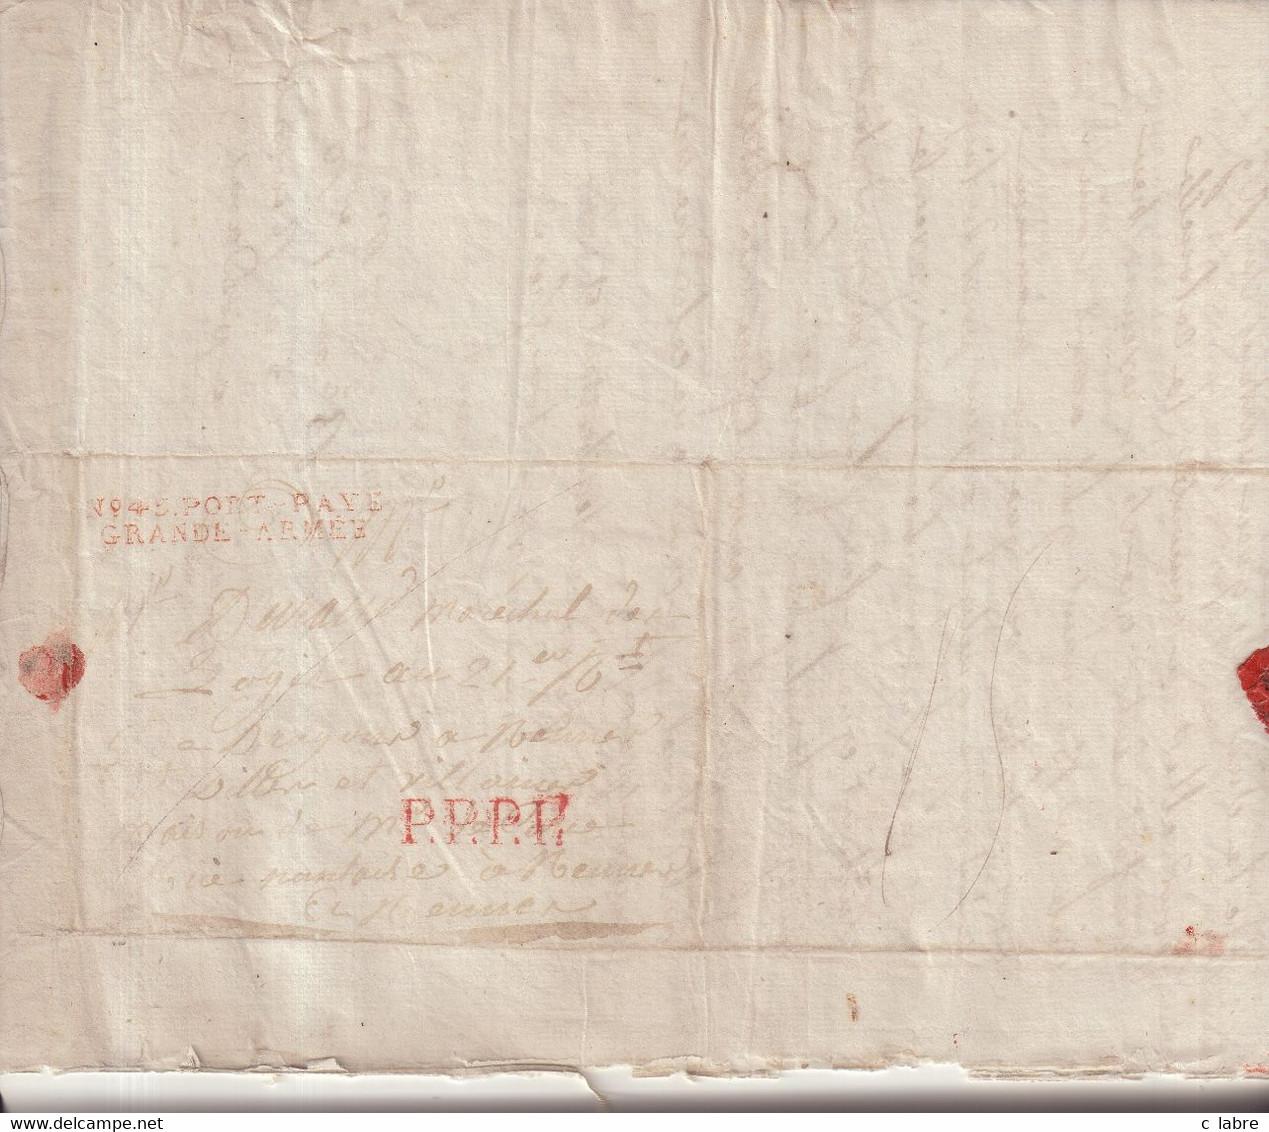 "FRANCE : MP . "" N° 45 PORT PAYE GRANDE ARMEE "" . EN ROUGE . DU 03/03/1808 .  DE POSTDAM .POUR RENNES . - Army Postmarks (before 1900)"